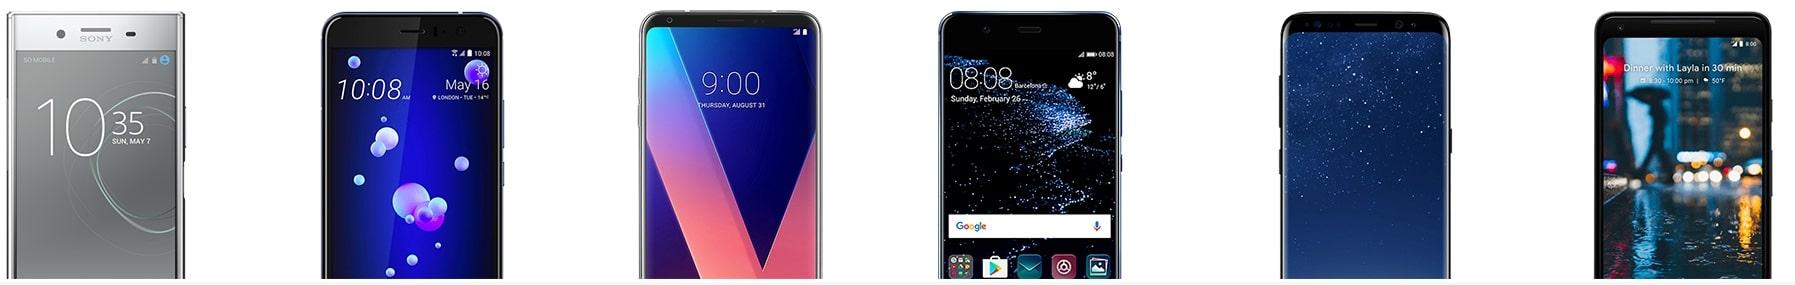 Cloner votre appareil Android.